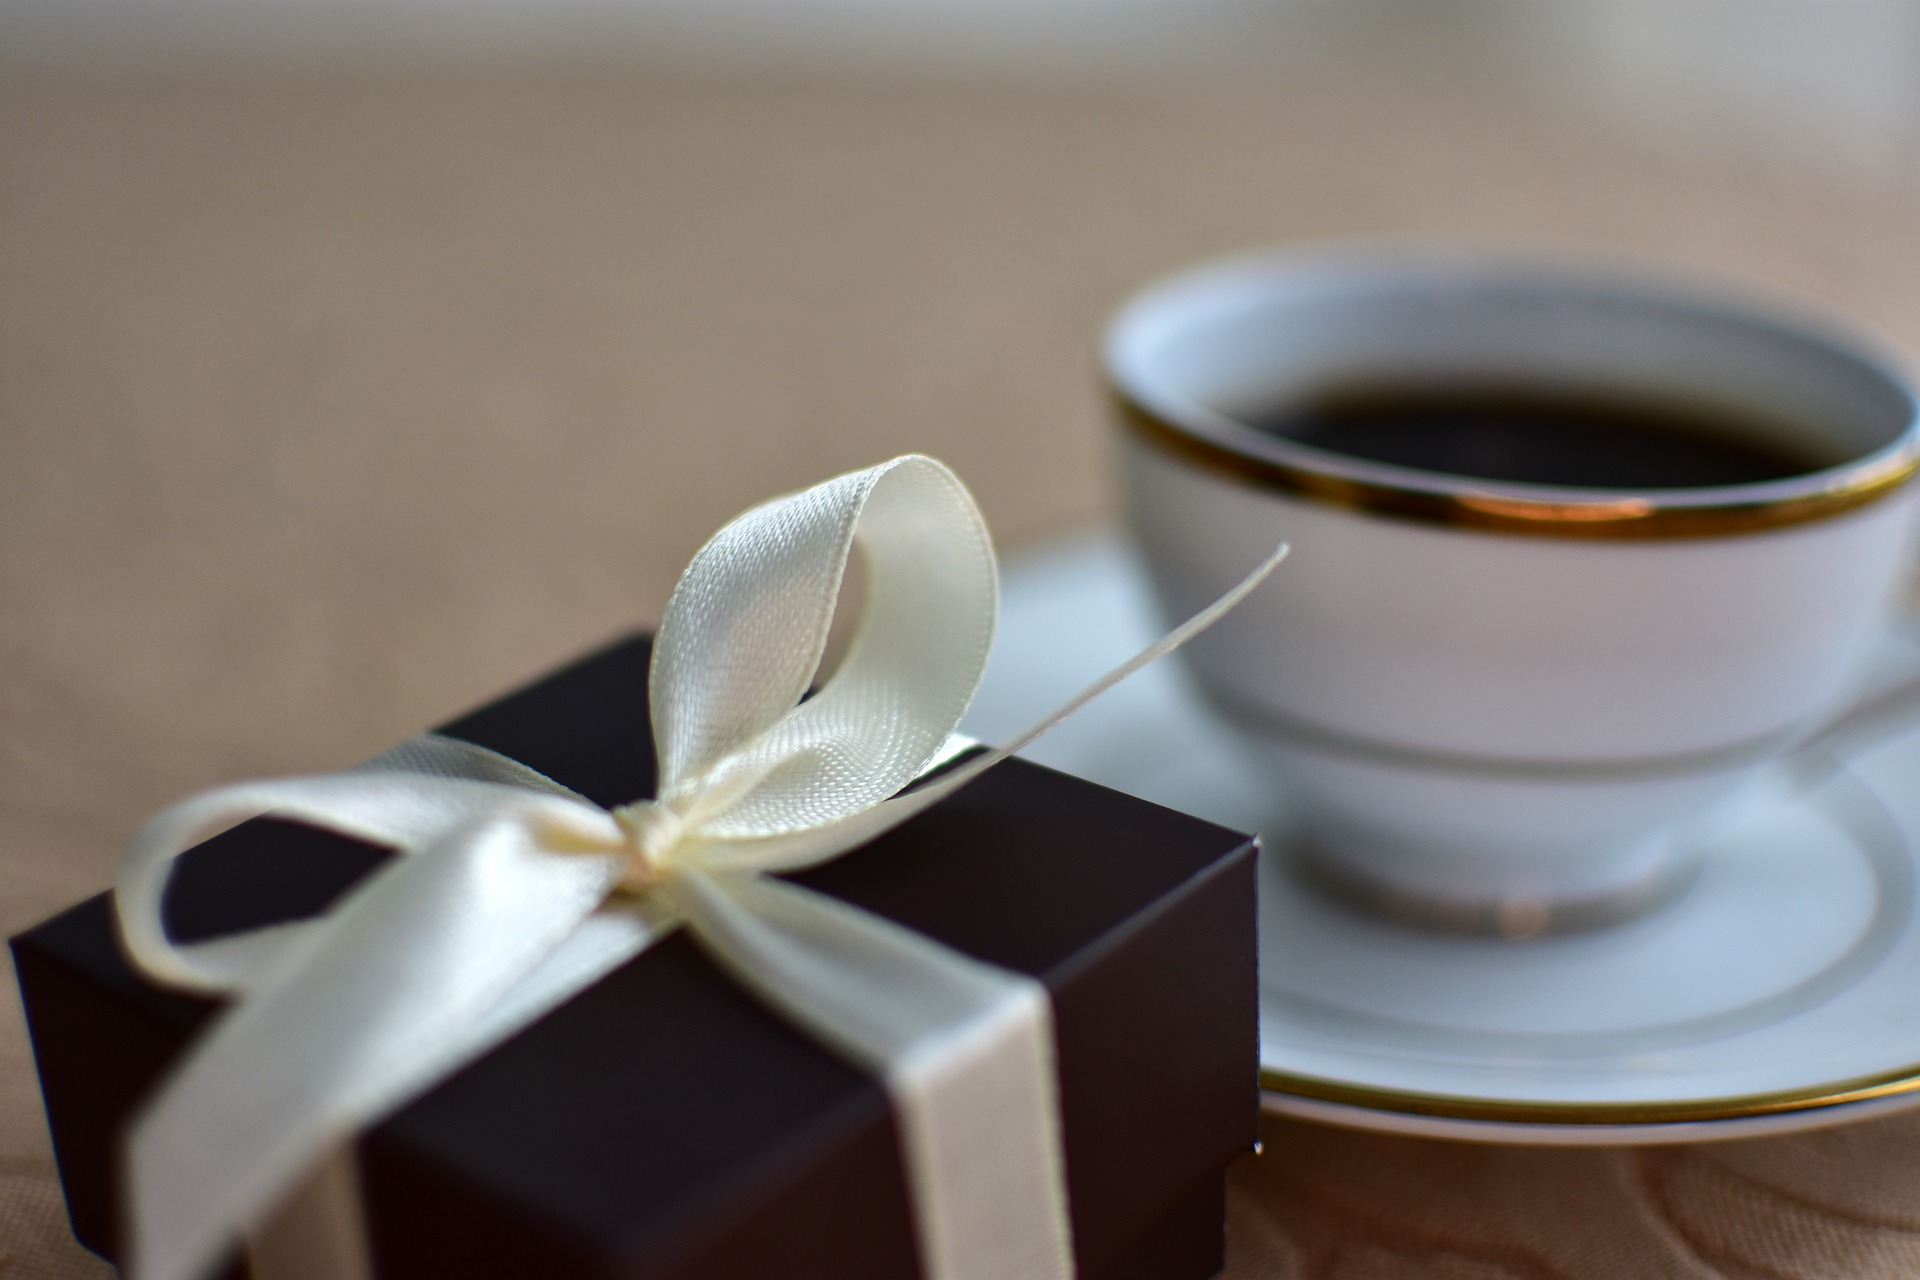 čaj s dárkem